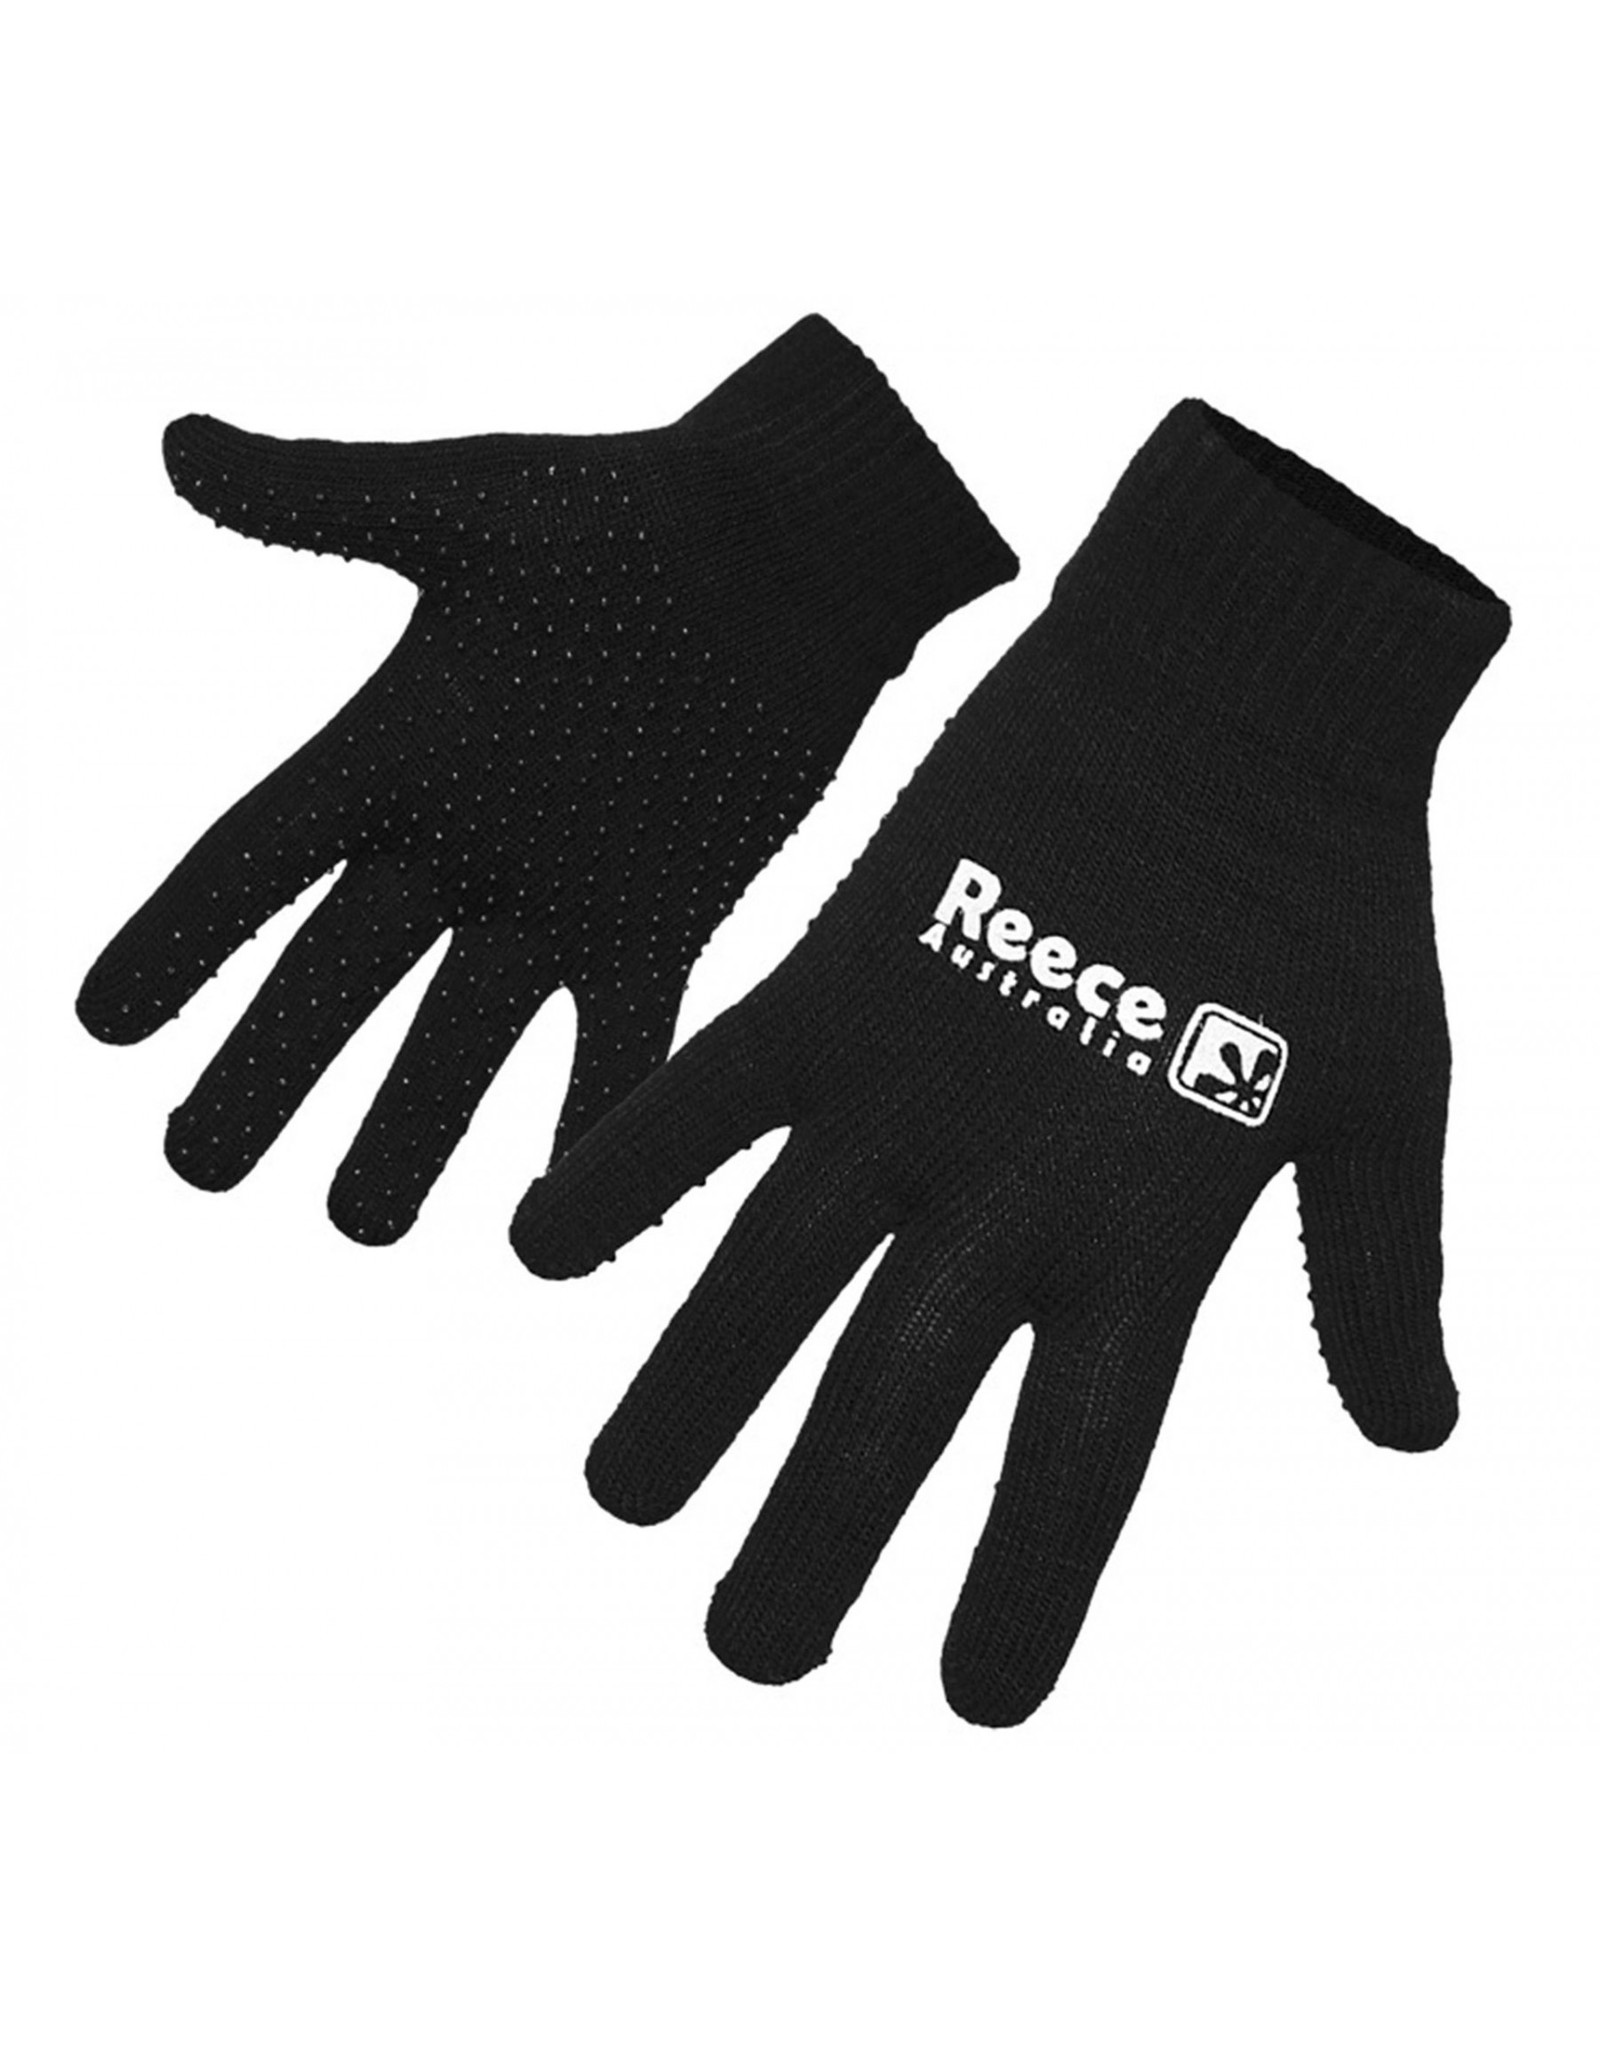 Reece Australia Knitted Player Glove